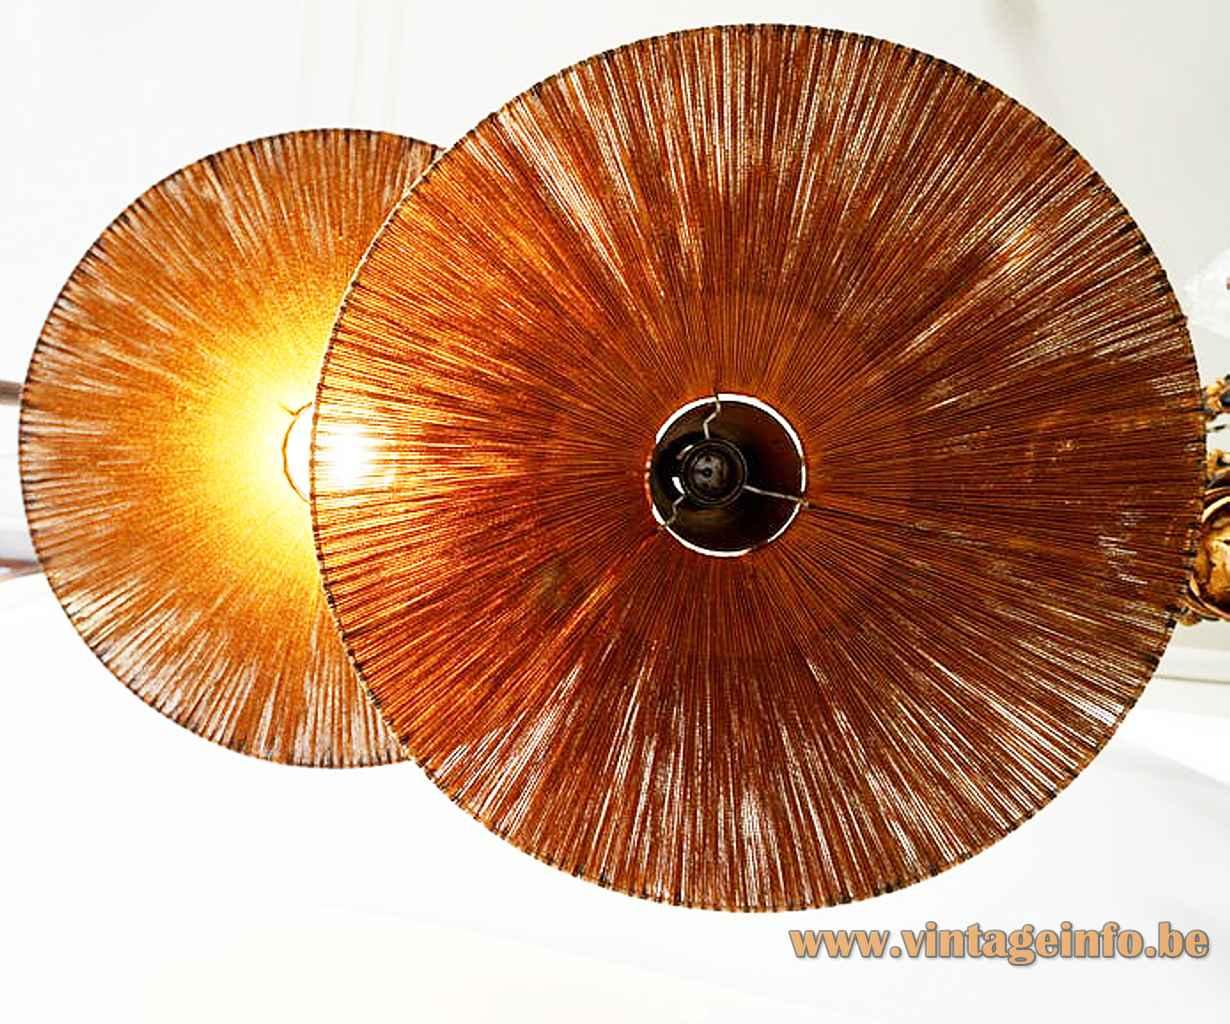 Temde sisal pendant lamp round conical cord braid lampshade teak wood cone 1950s 1960s inside view